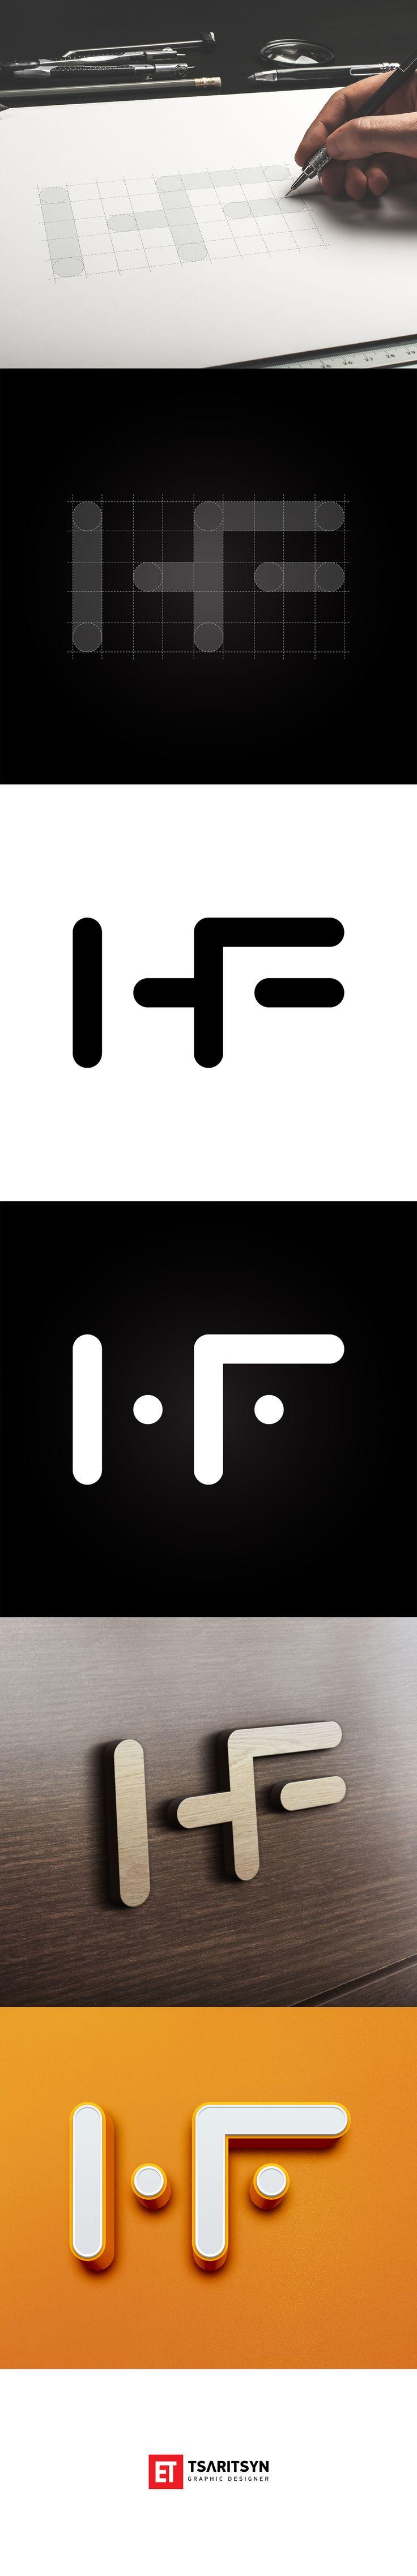 Monogram HF. Tsaritsyn Graphic Designer. Thanks you for watching!